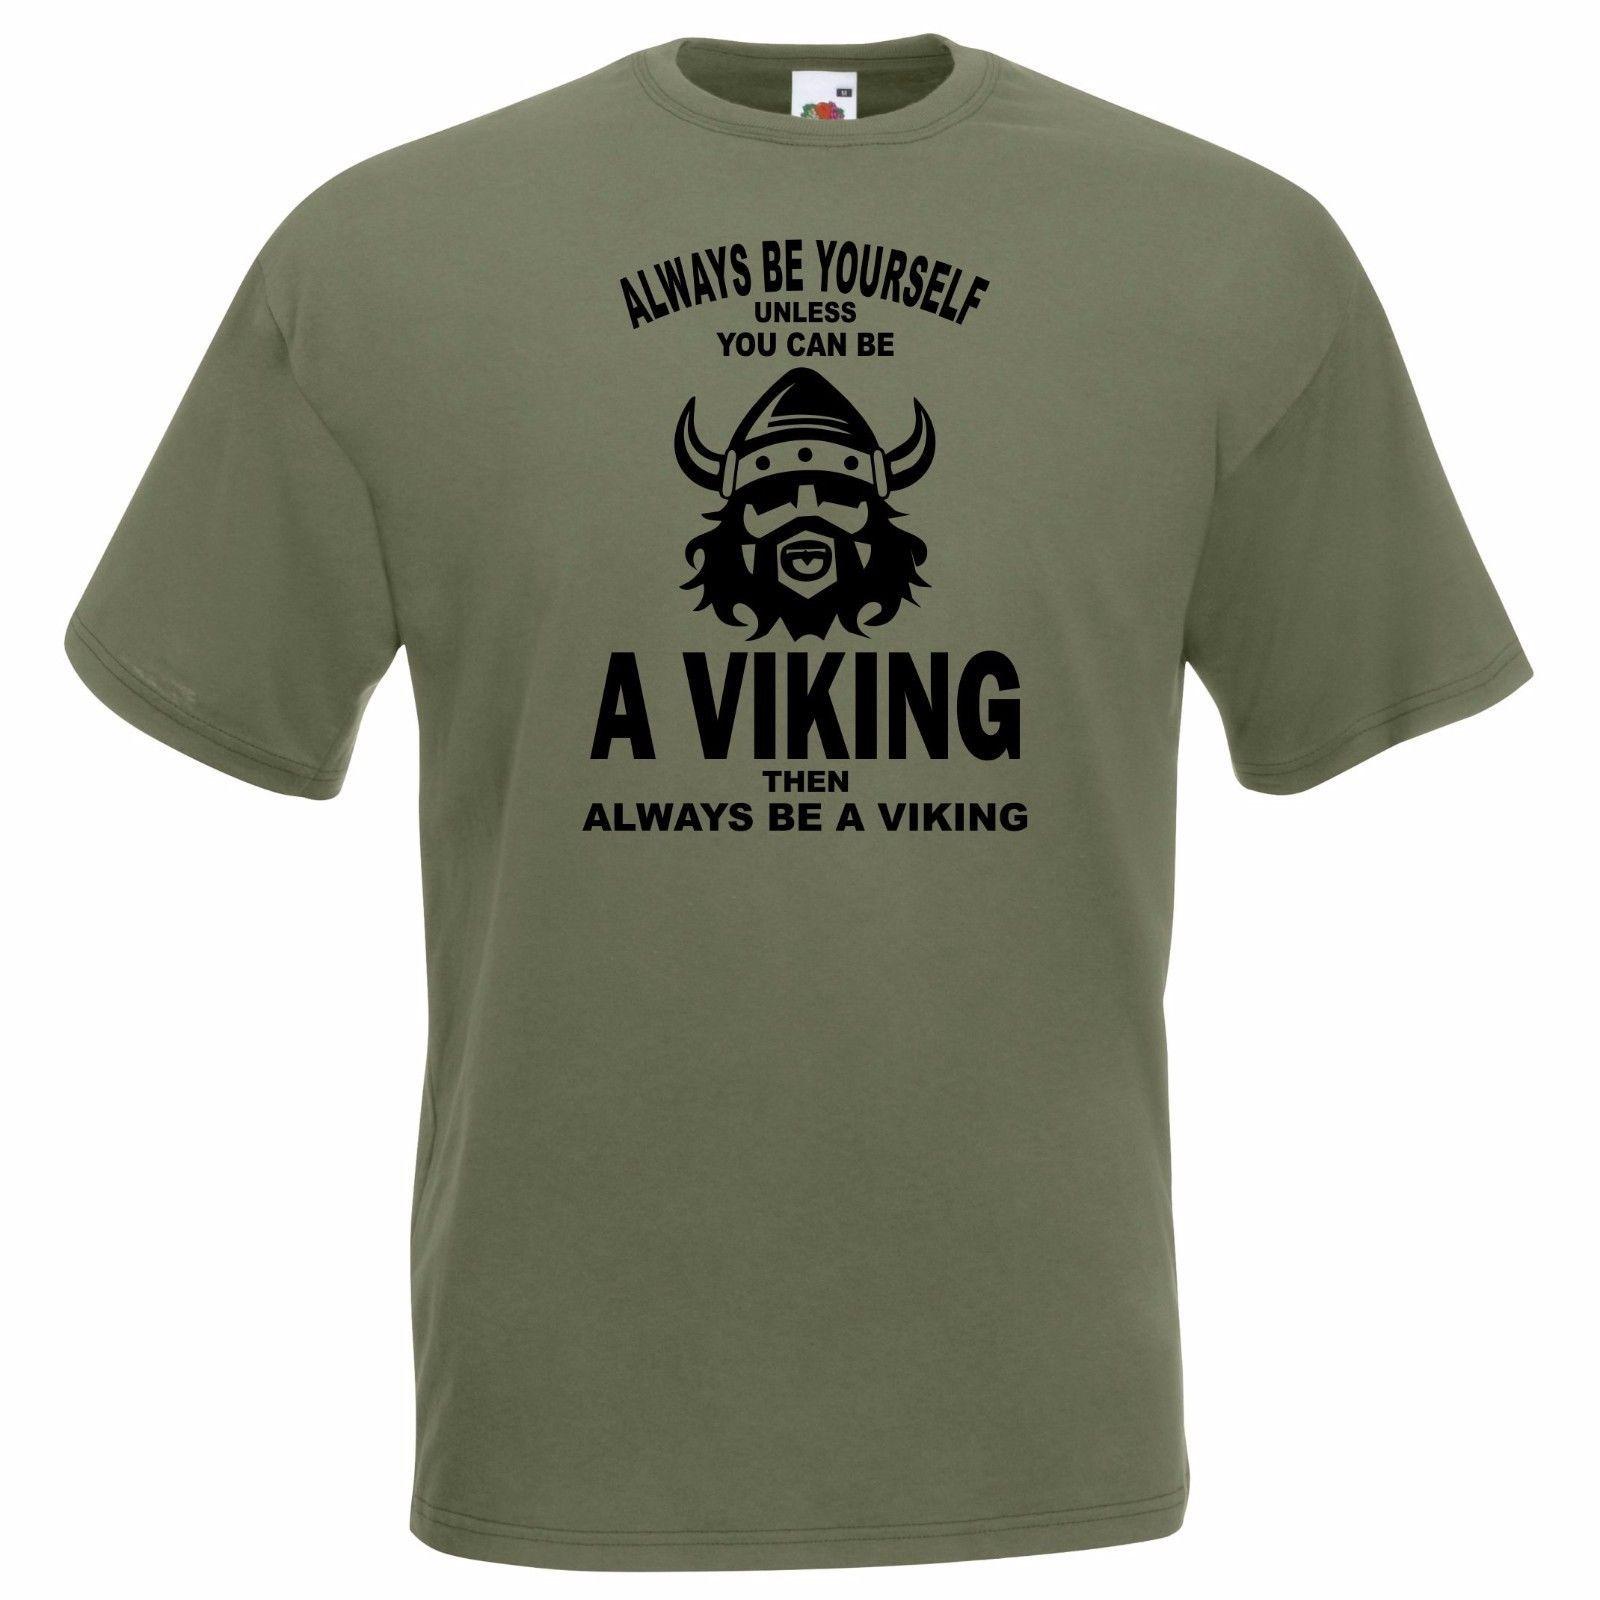 4de4dd49 Viking T Shirt Vikings TShirt Novelty Funny T Shirt Sizes S XXL Funny  Unisex Casual Deal With It T Shirt Ts Shirts From Tshirthutzone, $12.96|  DHgate.Com